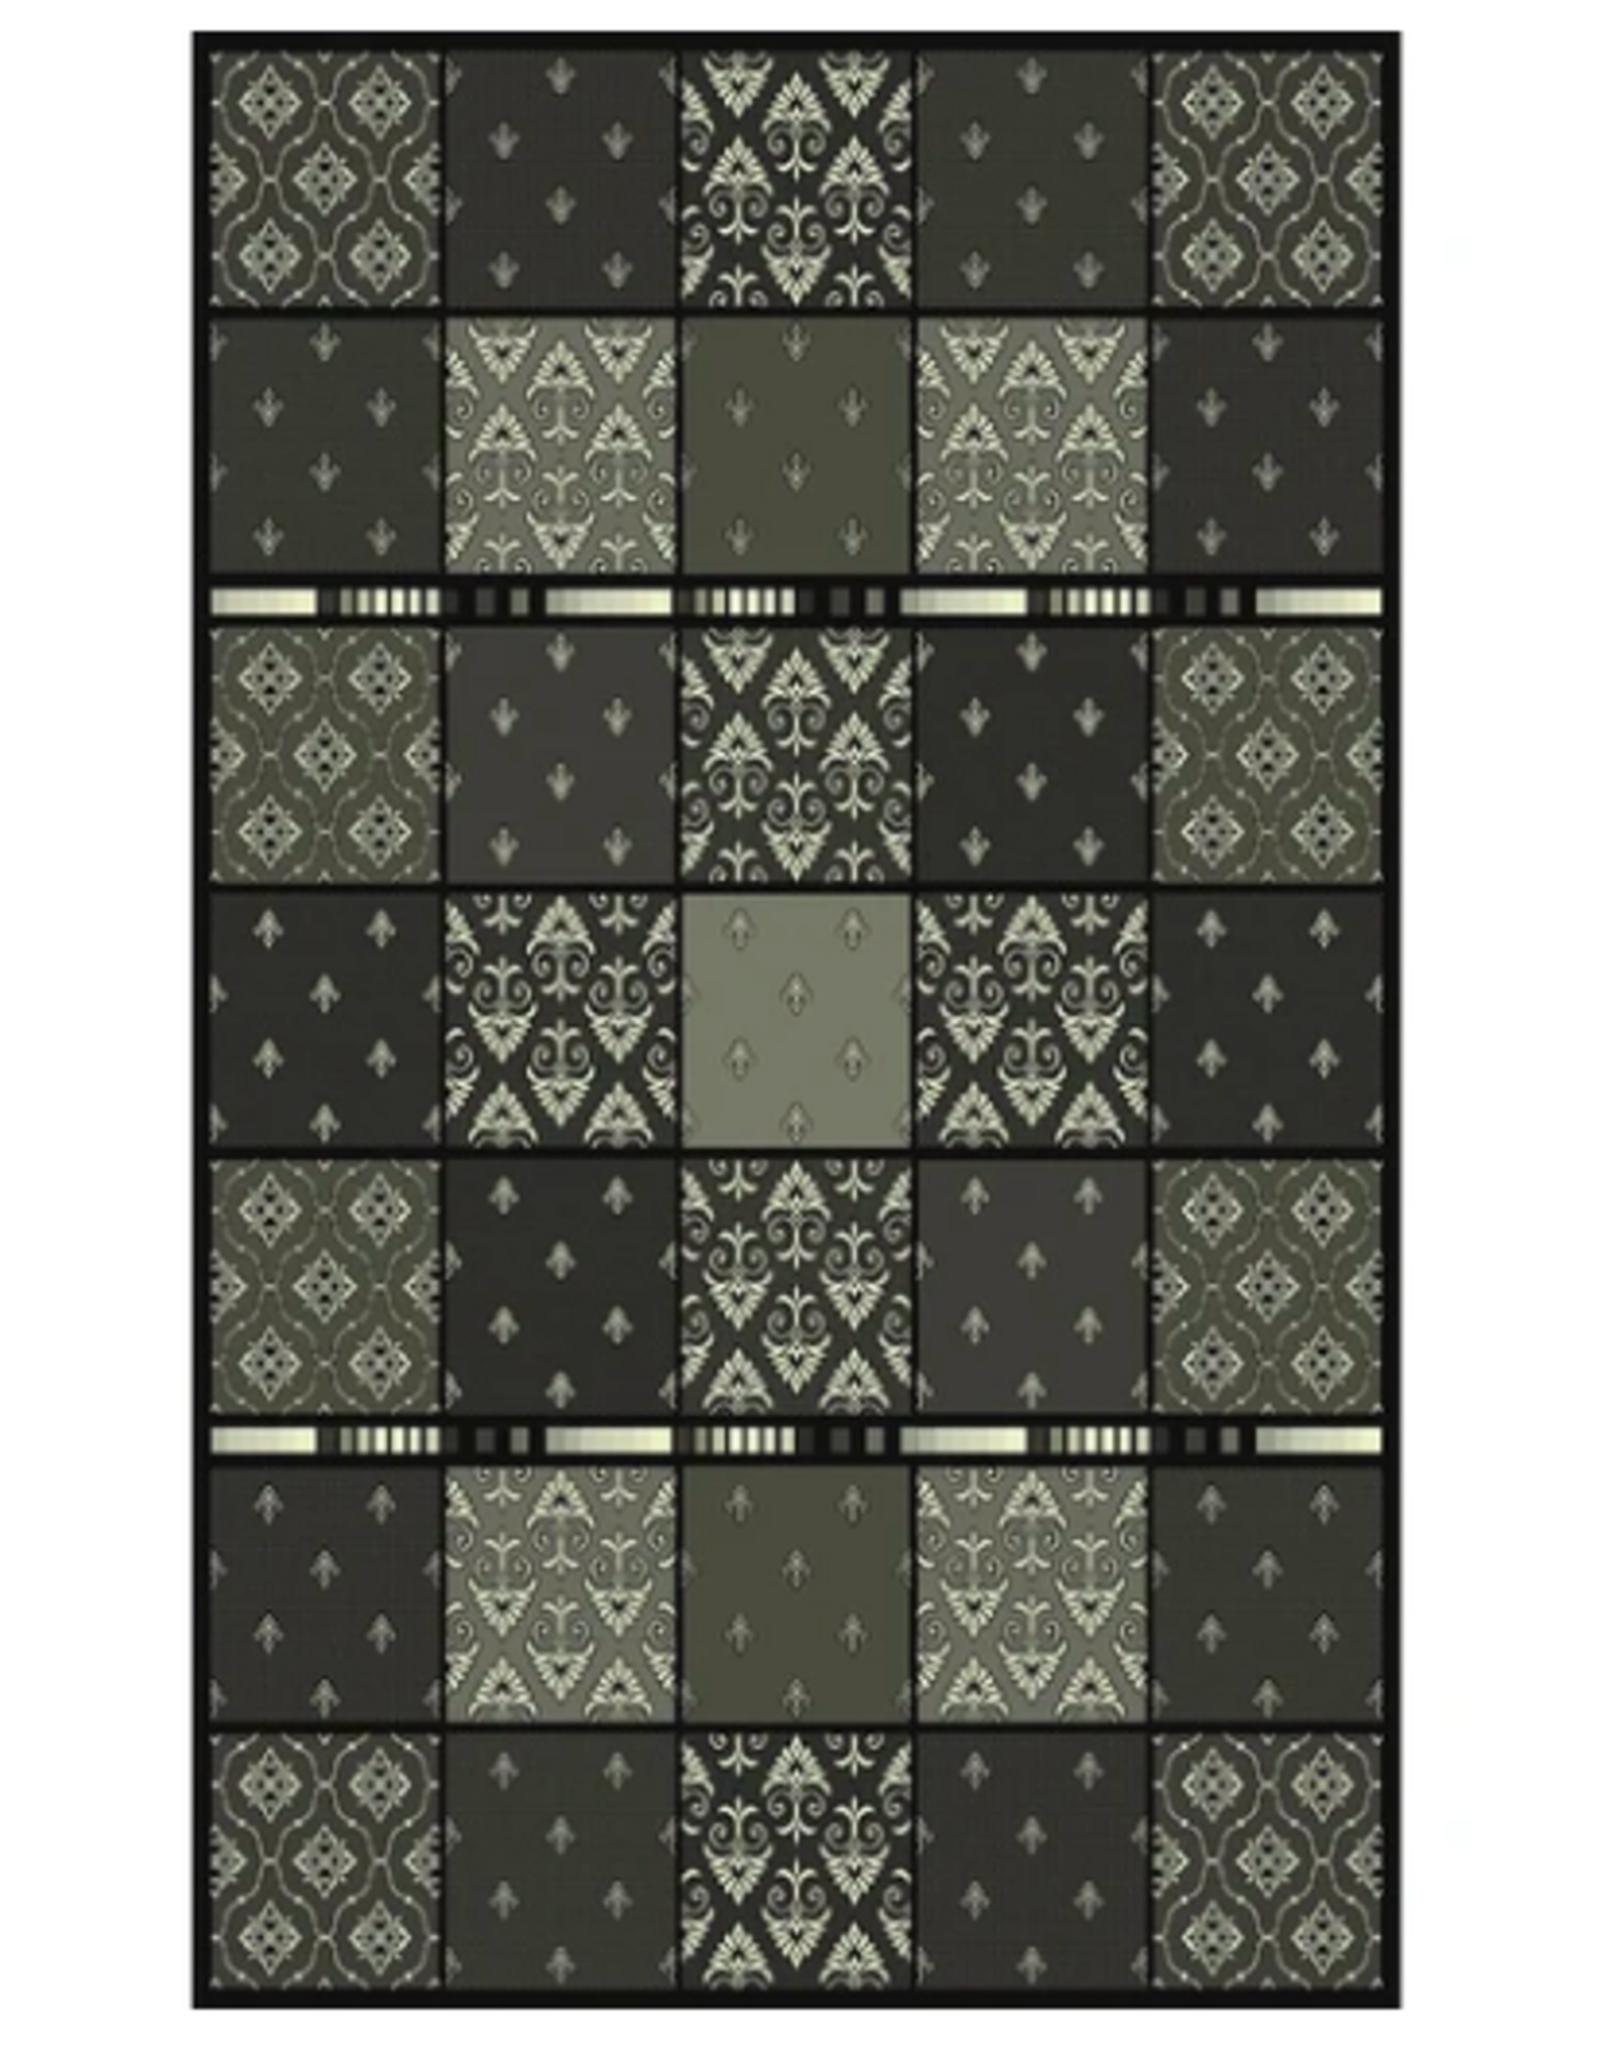 Rugs Avocado Artificial Silk 2'4 x 3'7 Everest Black